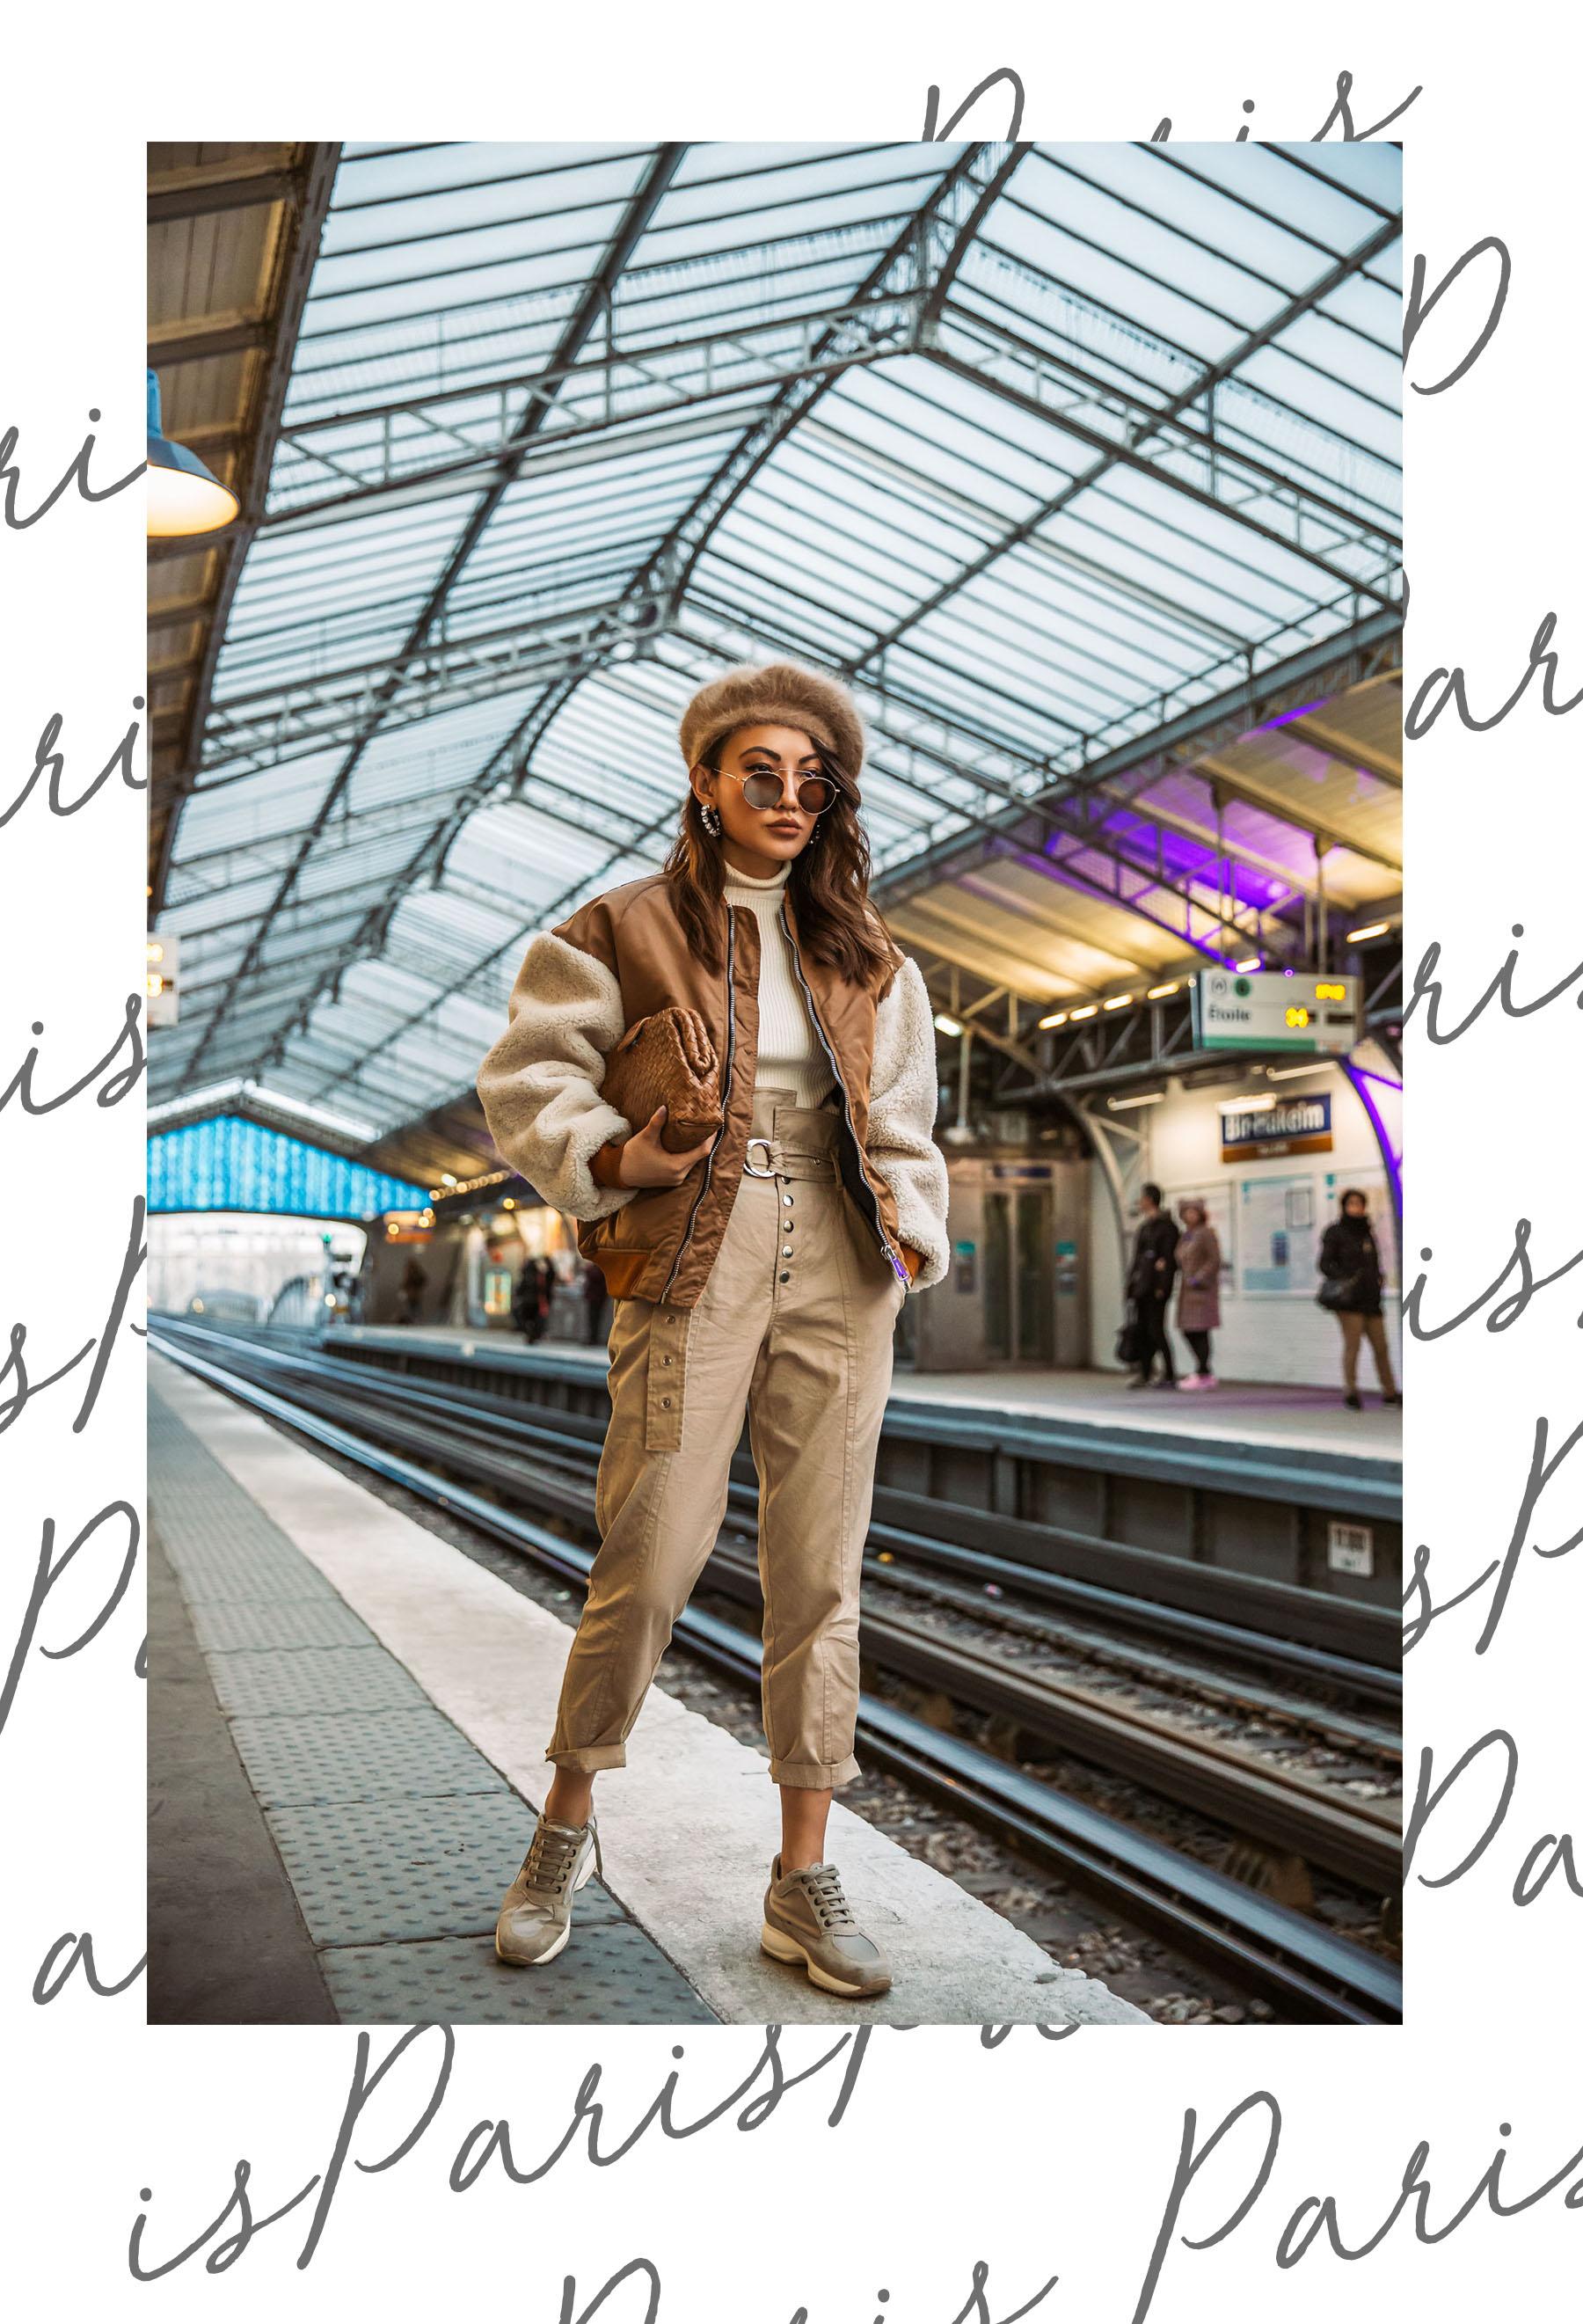 How to Experience Paris like a Local - Subway station in Paris, Paris Metro // Notjessfashion.com